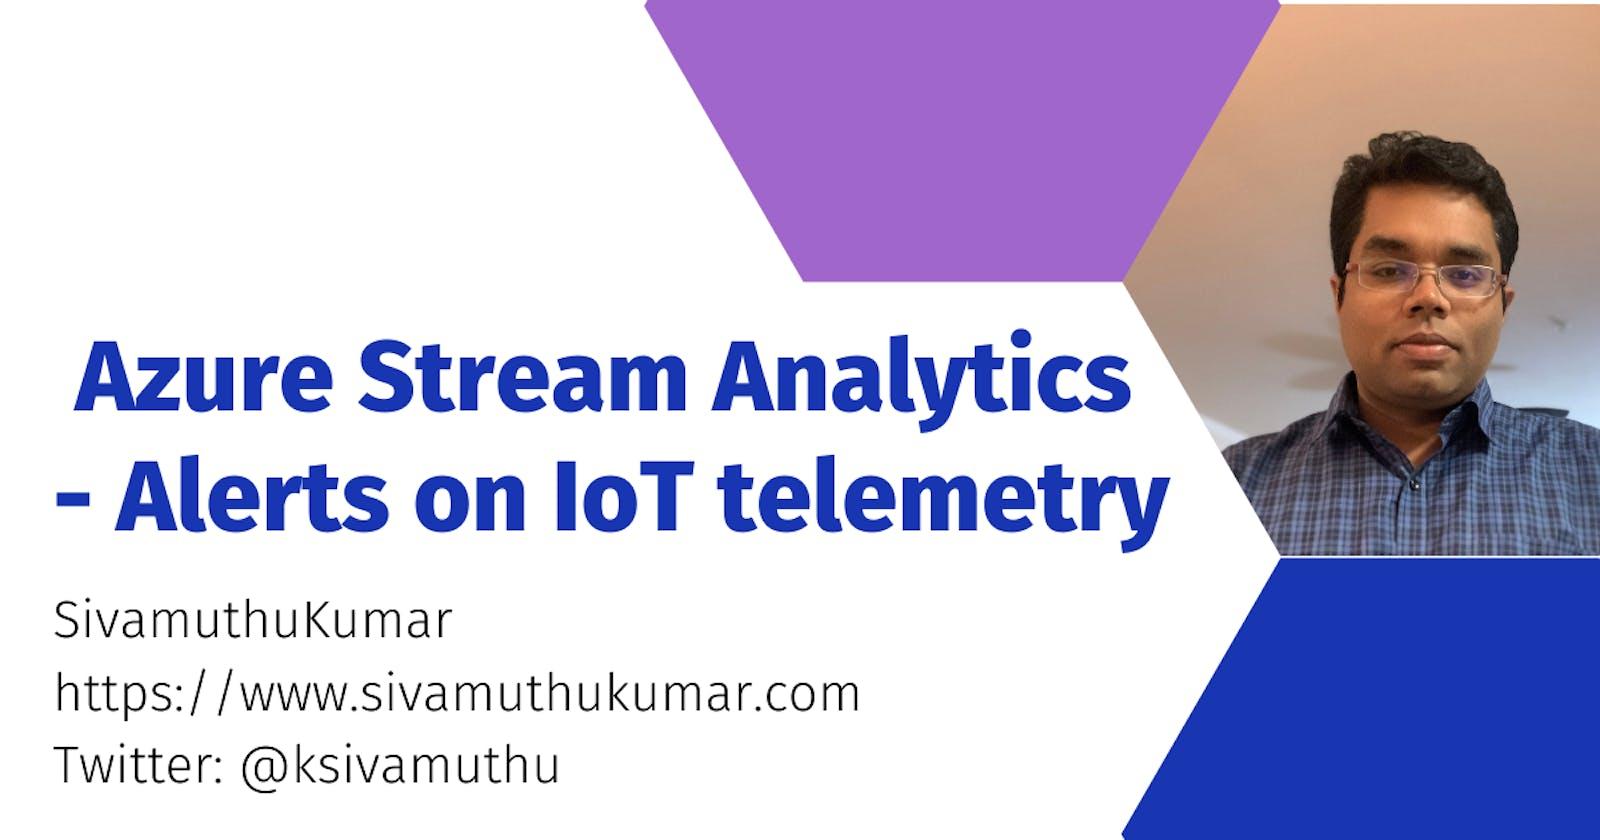 Azure Stream Analytics - Alerts on IoT telemetry